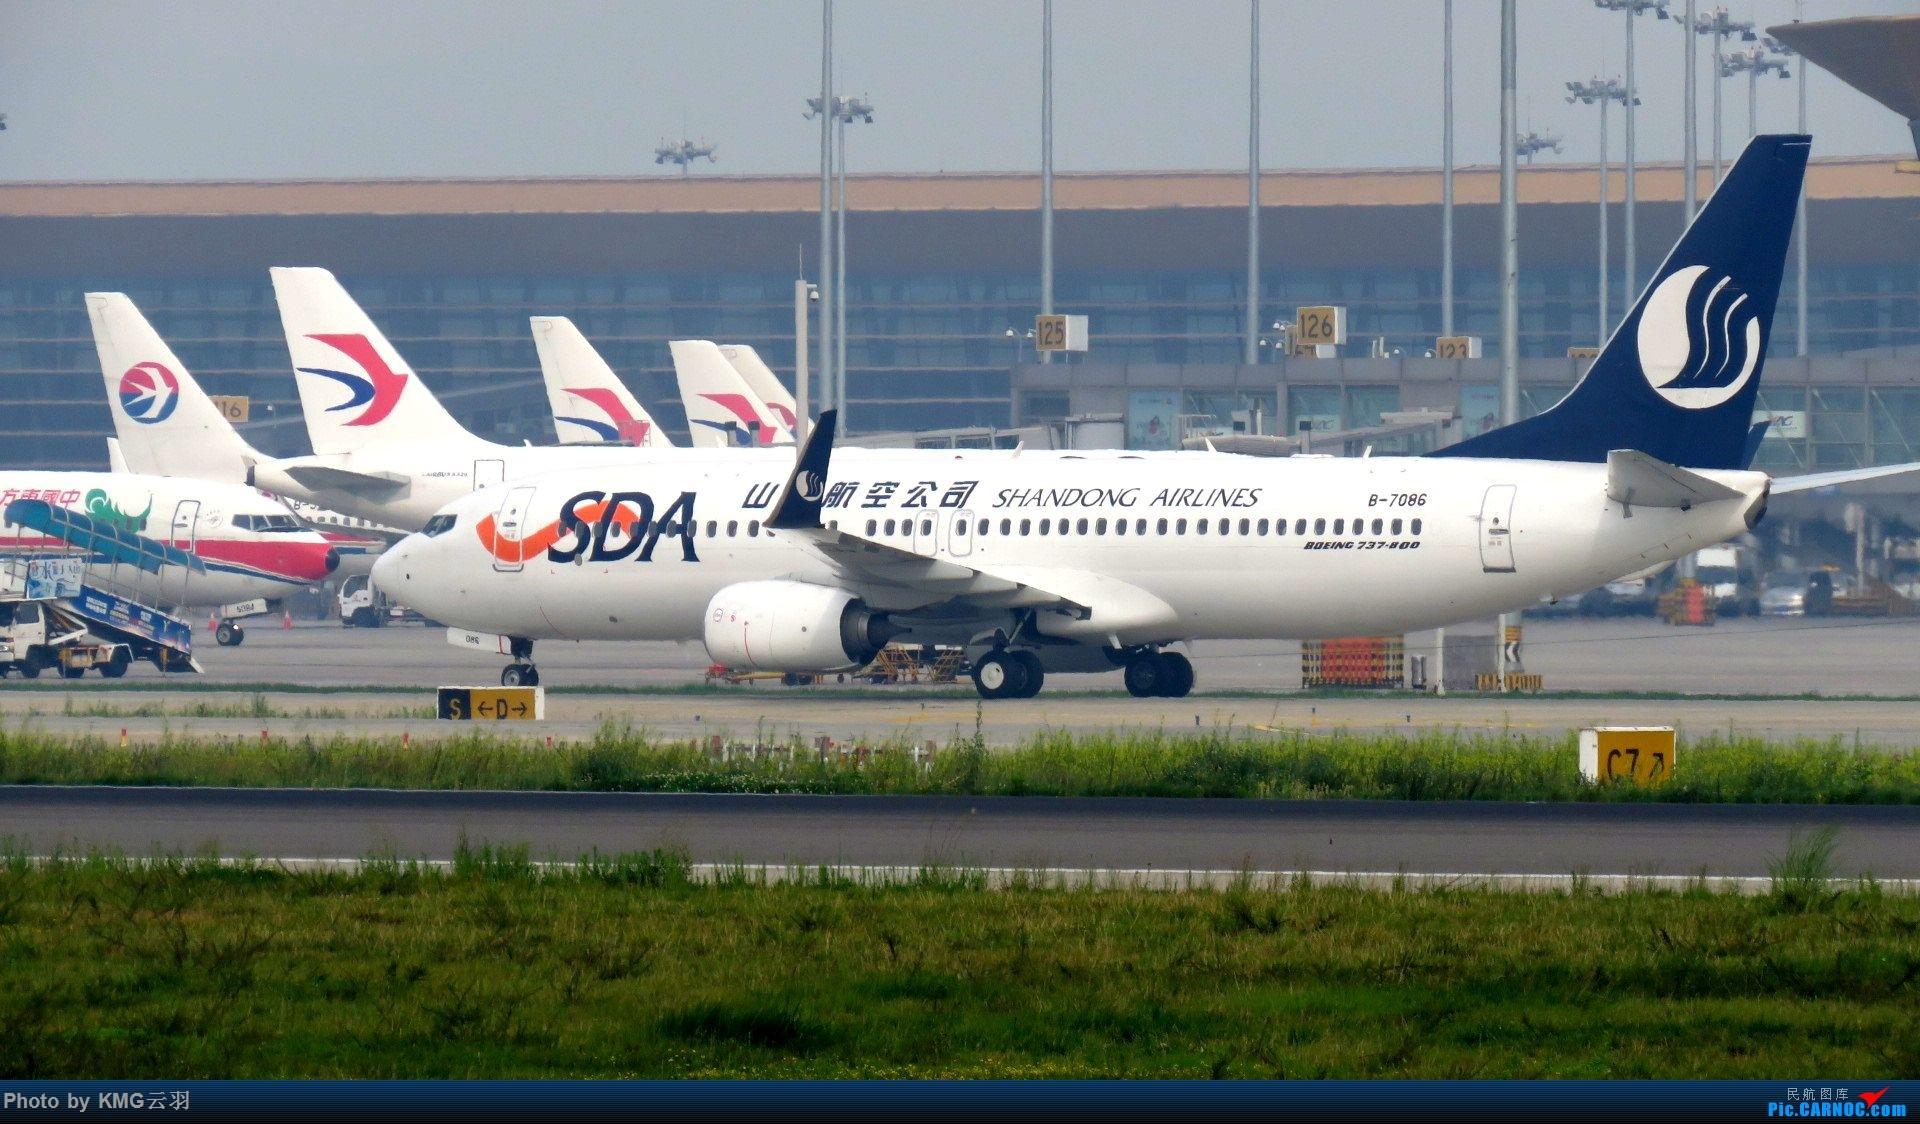 Re:[原创]KMG东跑随拍 BOEING 737-800 B-7086 中国昆明长水国际机场